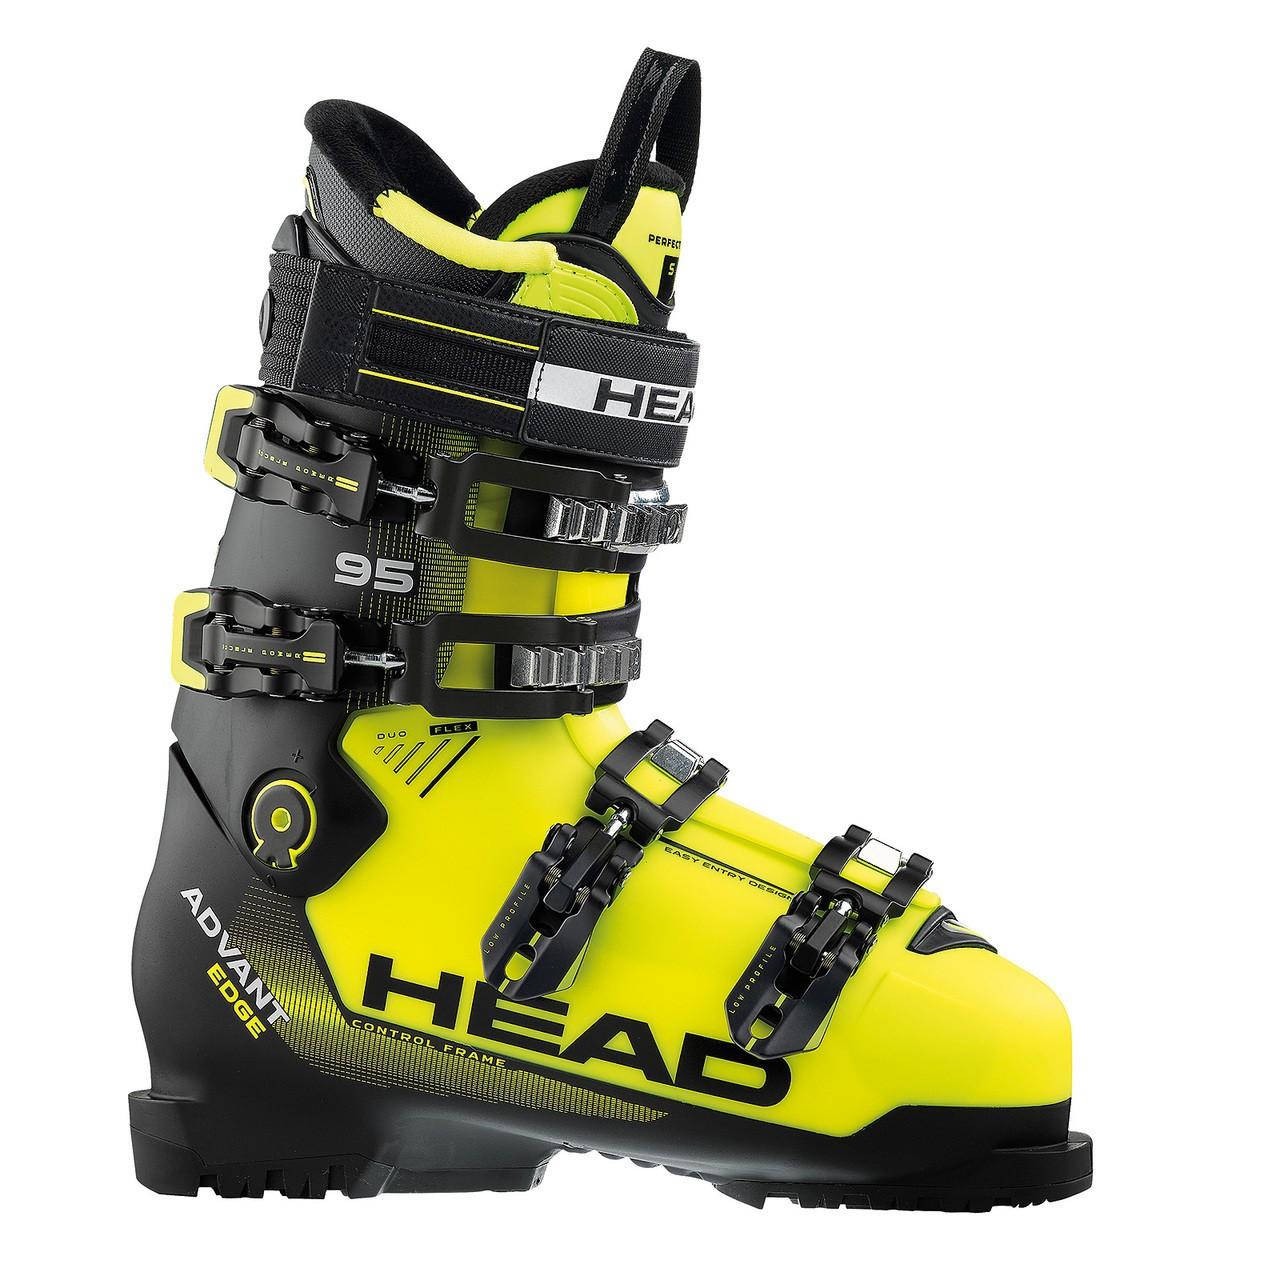 ad44c8f81d9 Head Advant Edge 95 Yellow Black - 29